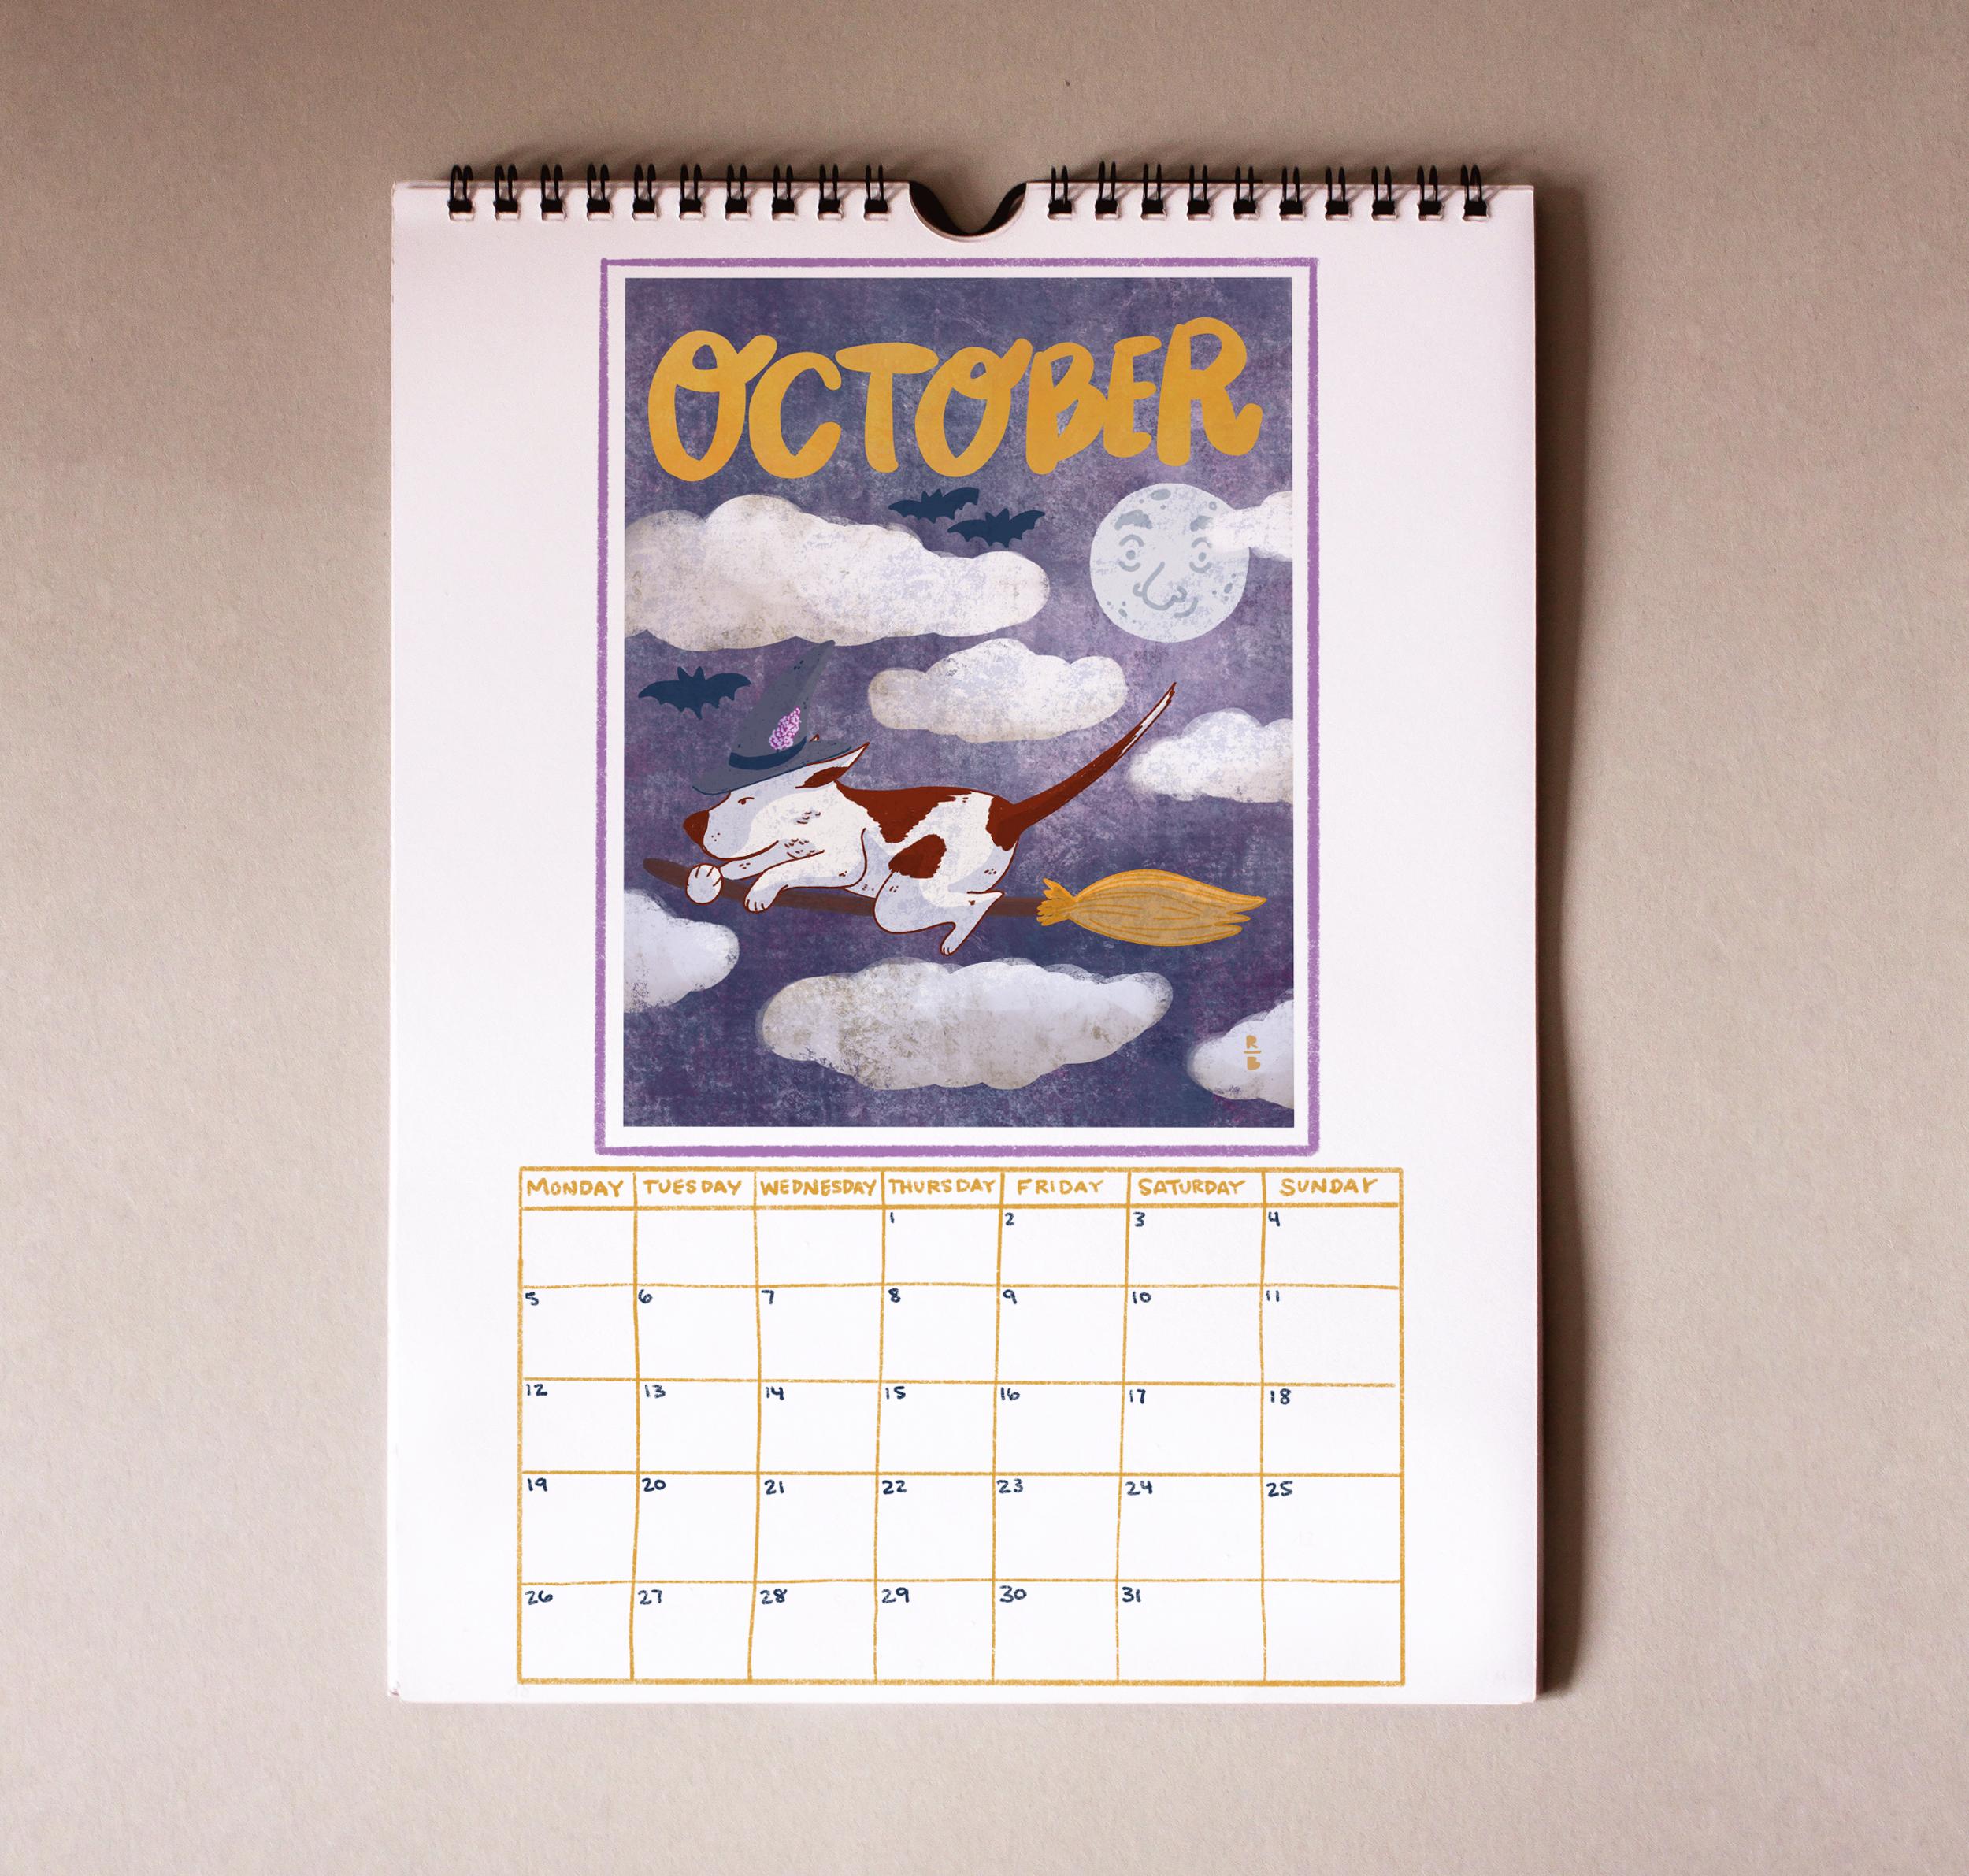 October of the 2020 Marti Calendar